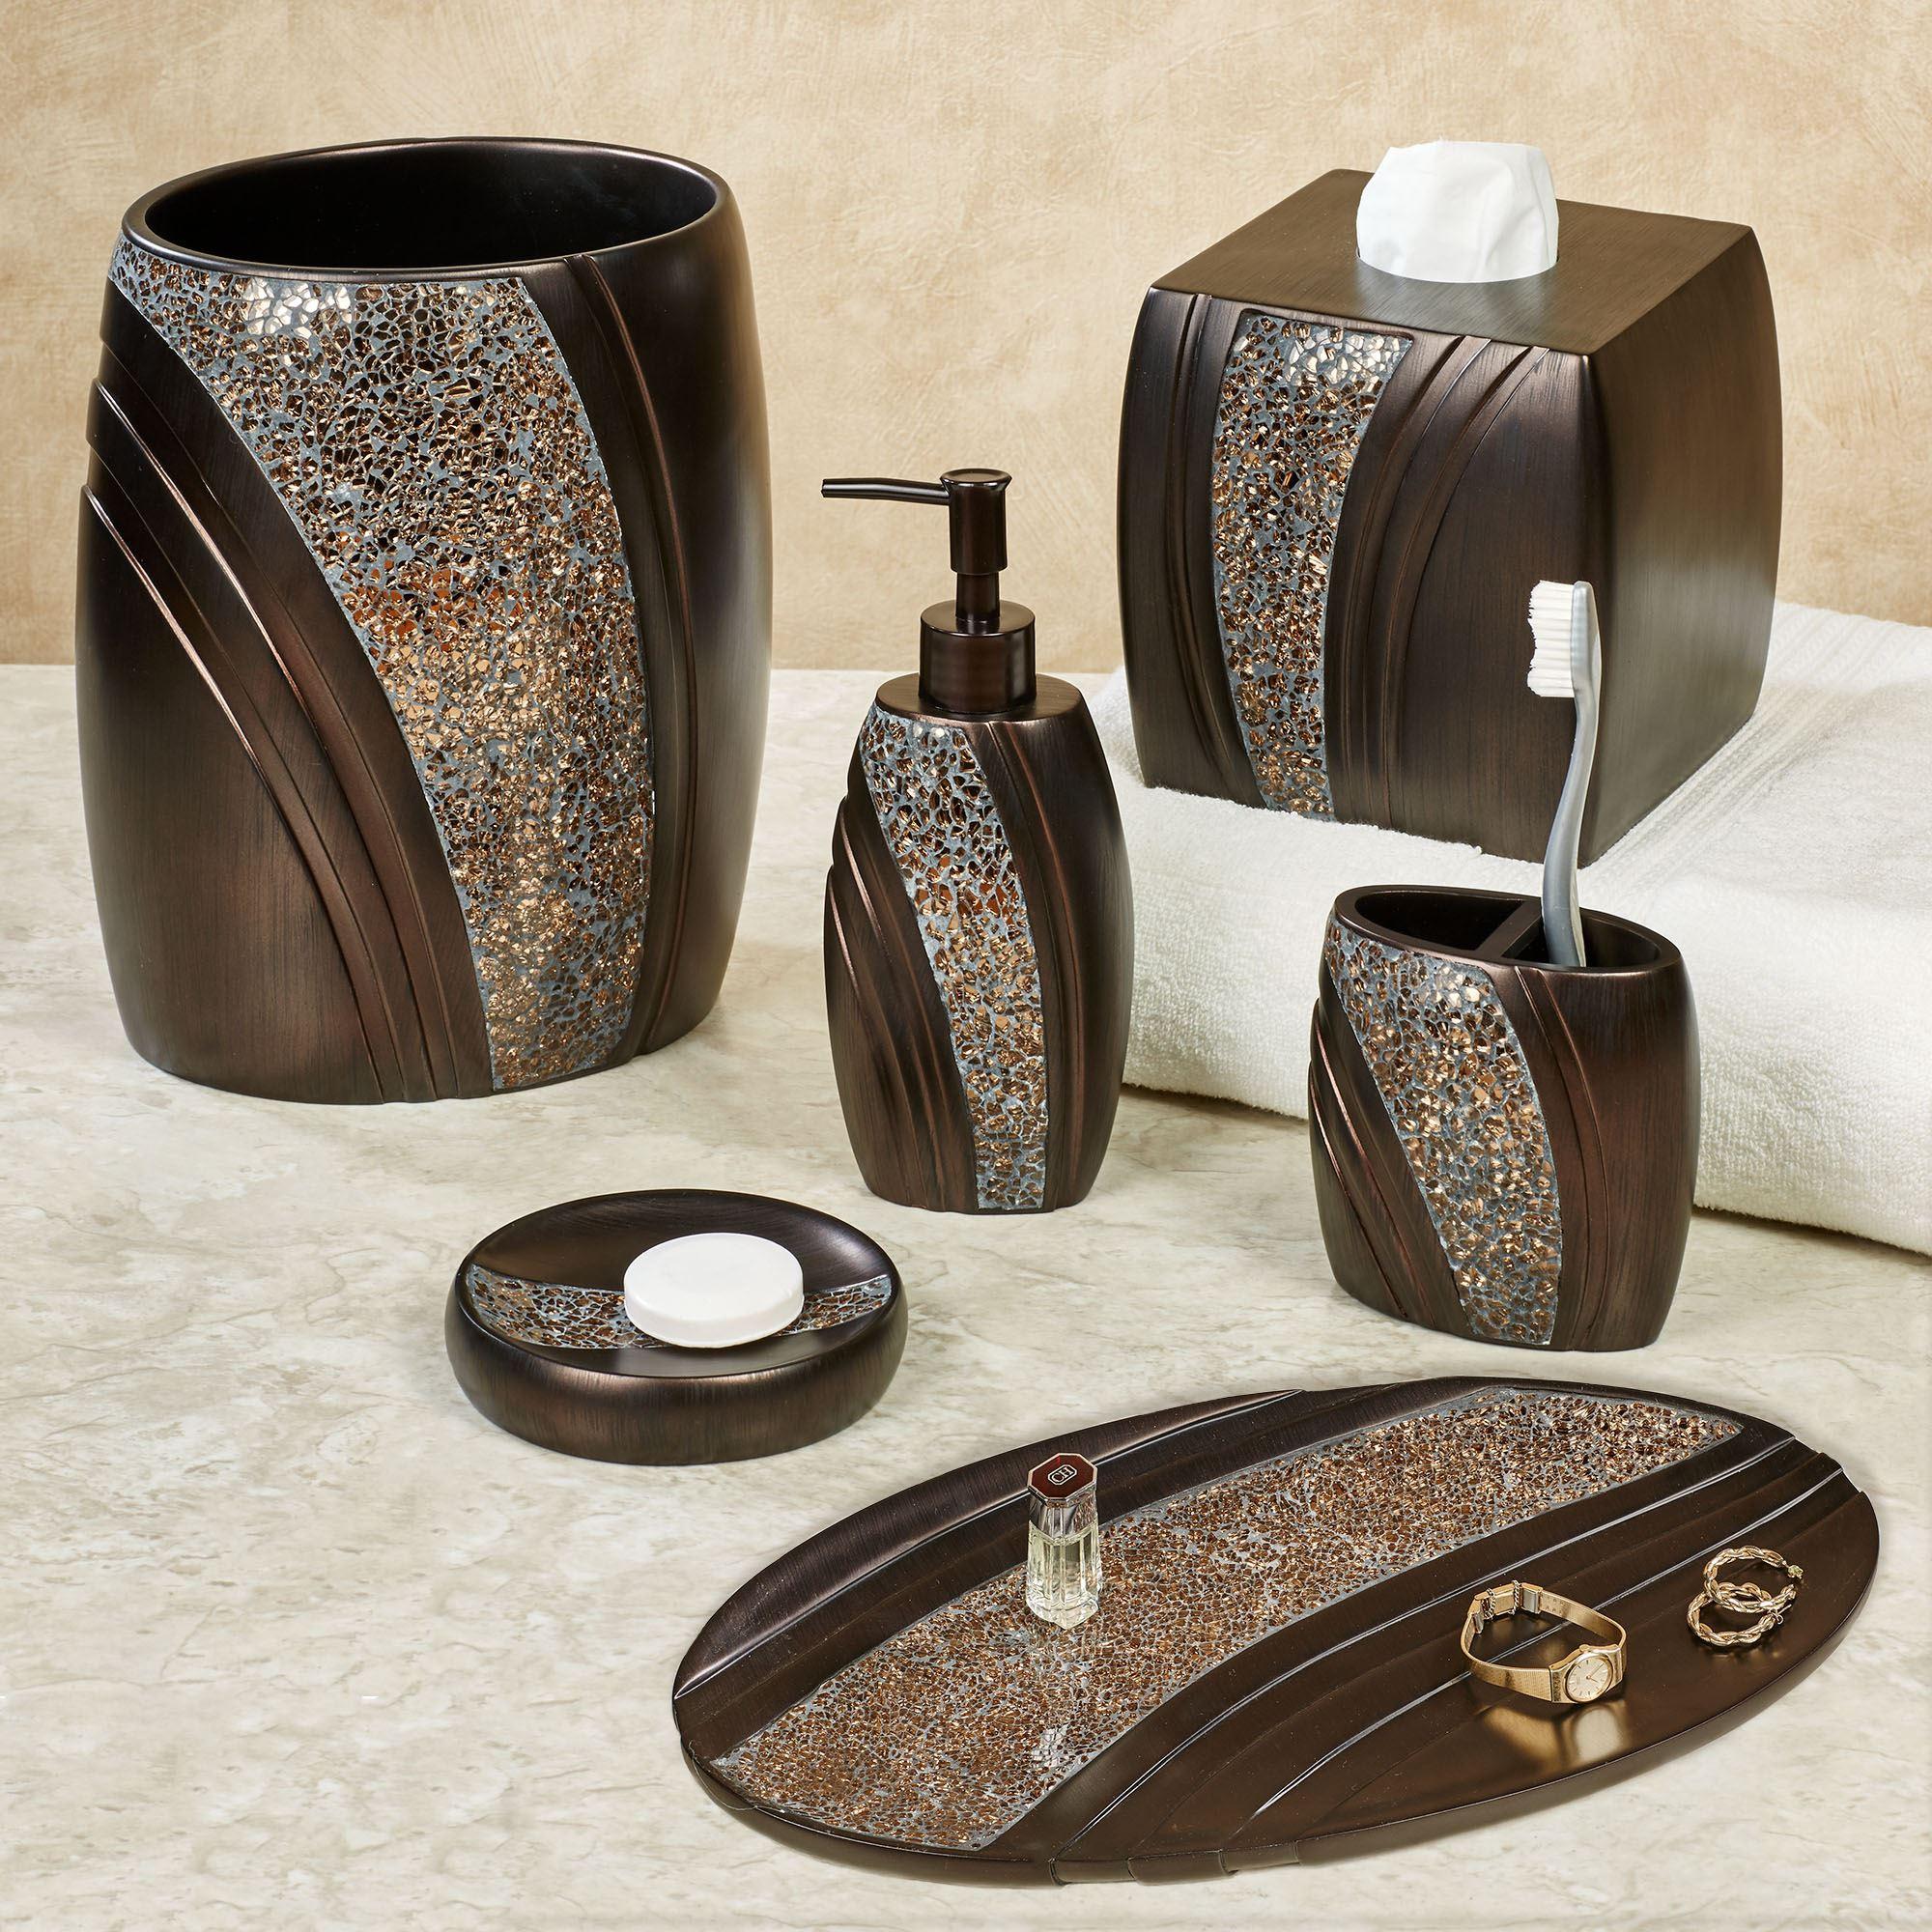 Best ideas about Bronze Bathroom Accessories . Save or Pin Grandeur Mosaic Bronze Bath Accessories Now.